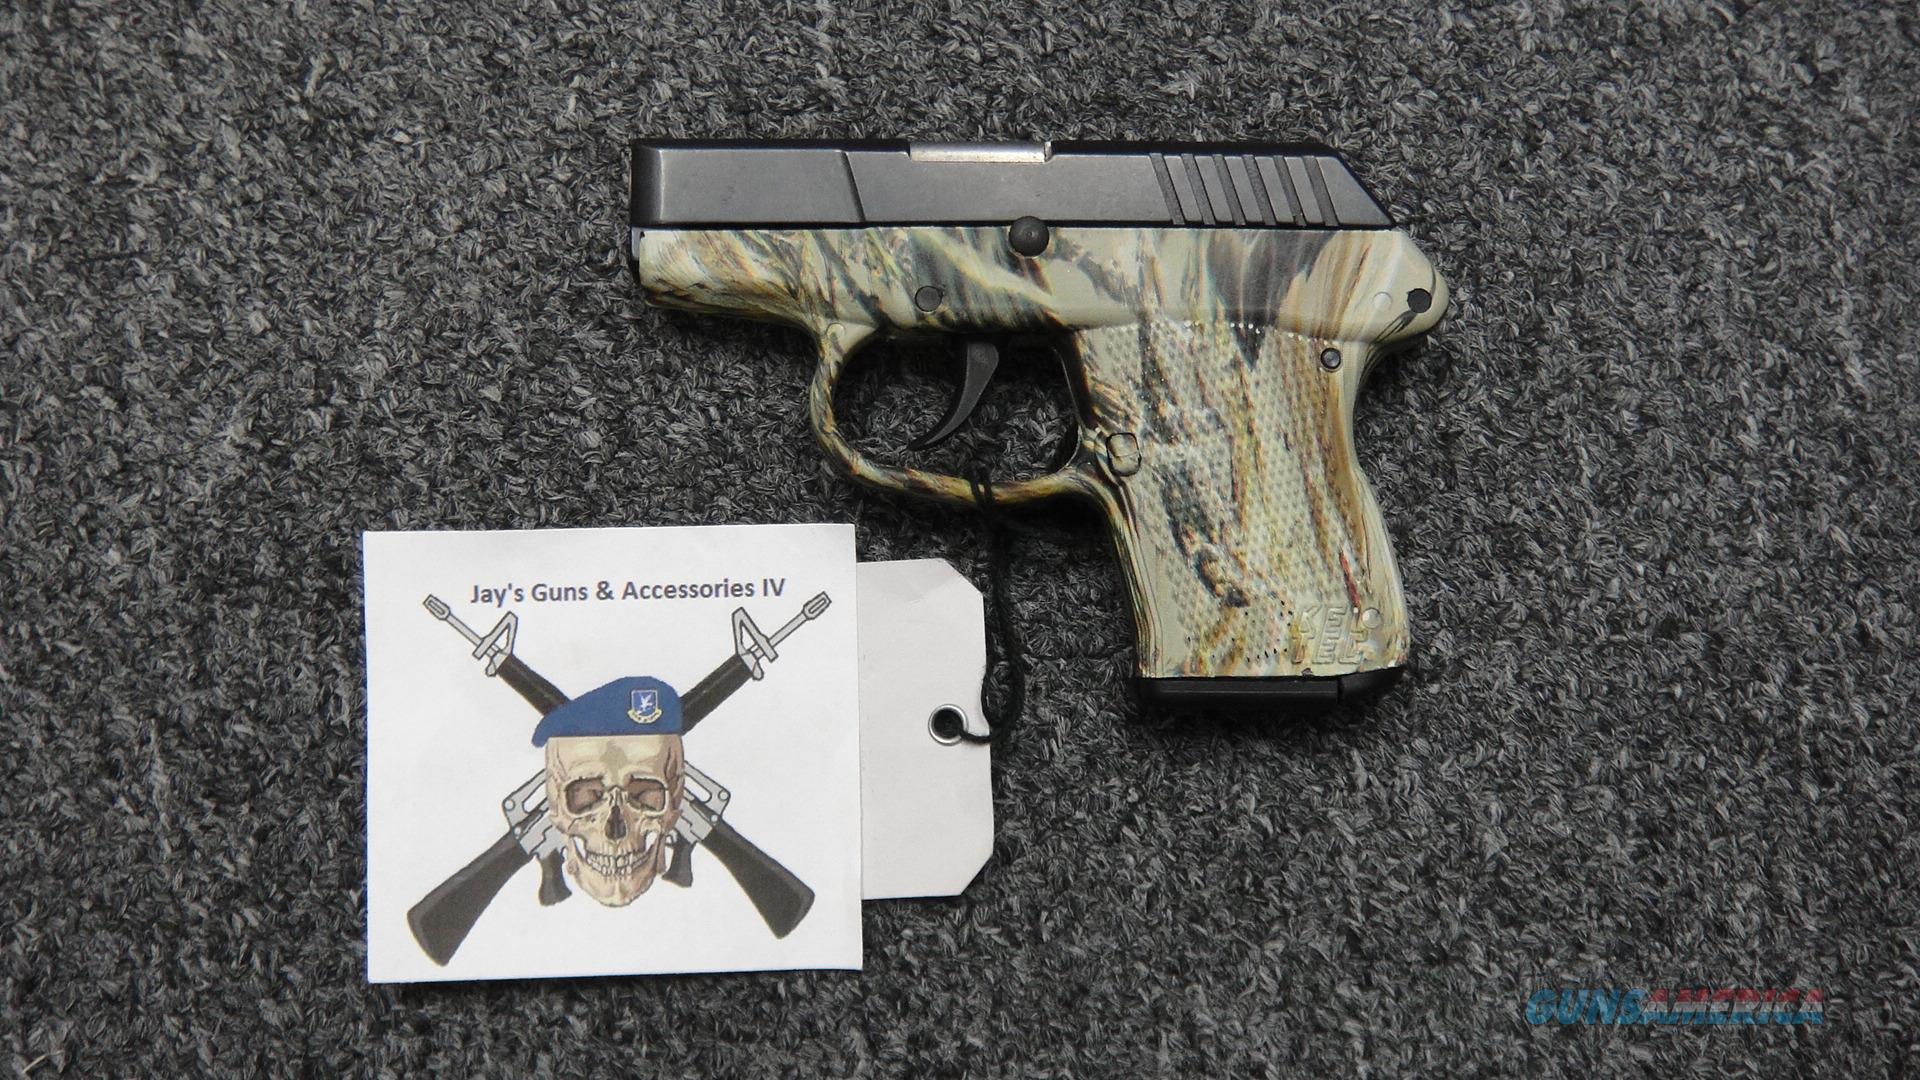 Kel-Tec P3AT .380ACP True Timber Camo  Guns > Pistols > Kel-Tec Pistols > Pocket Pistol Type